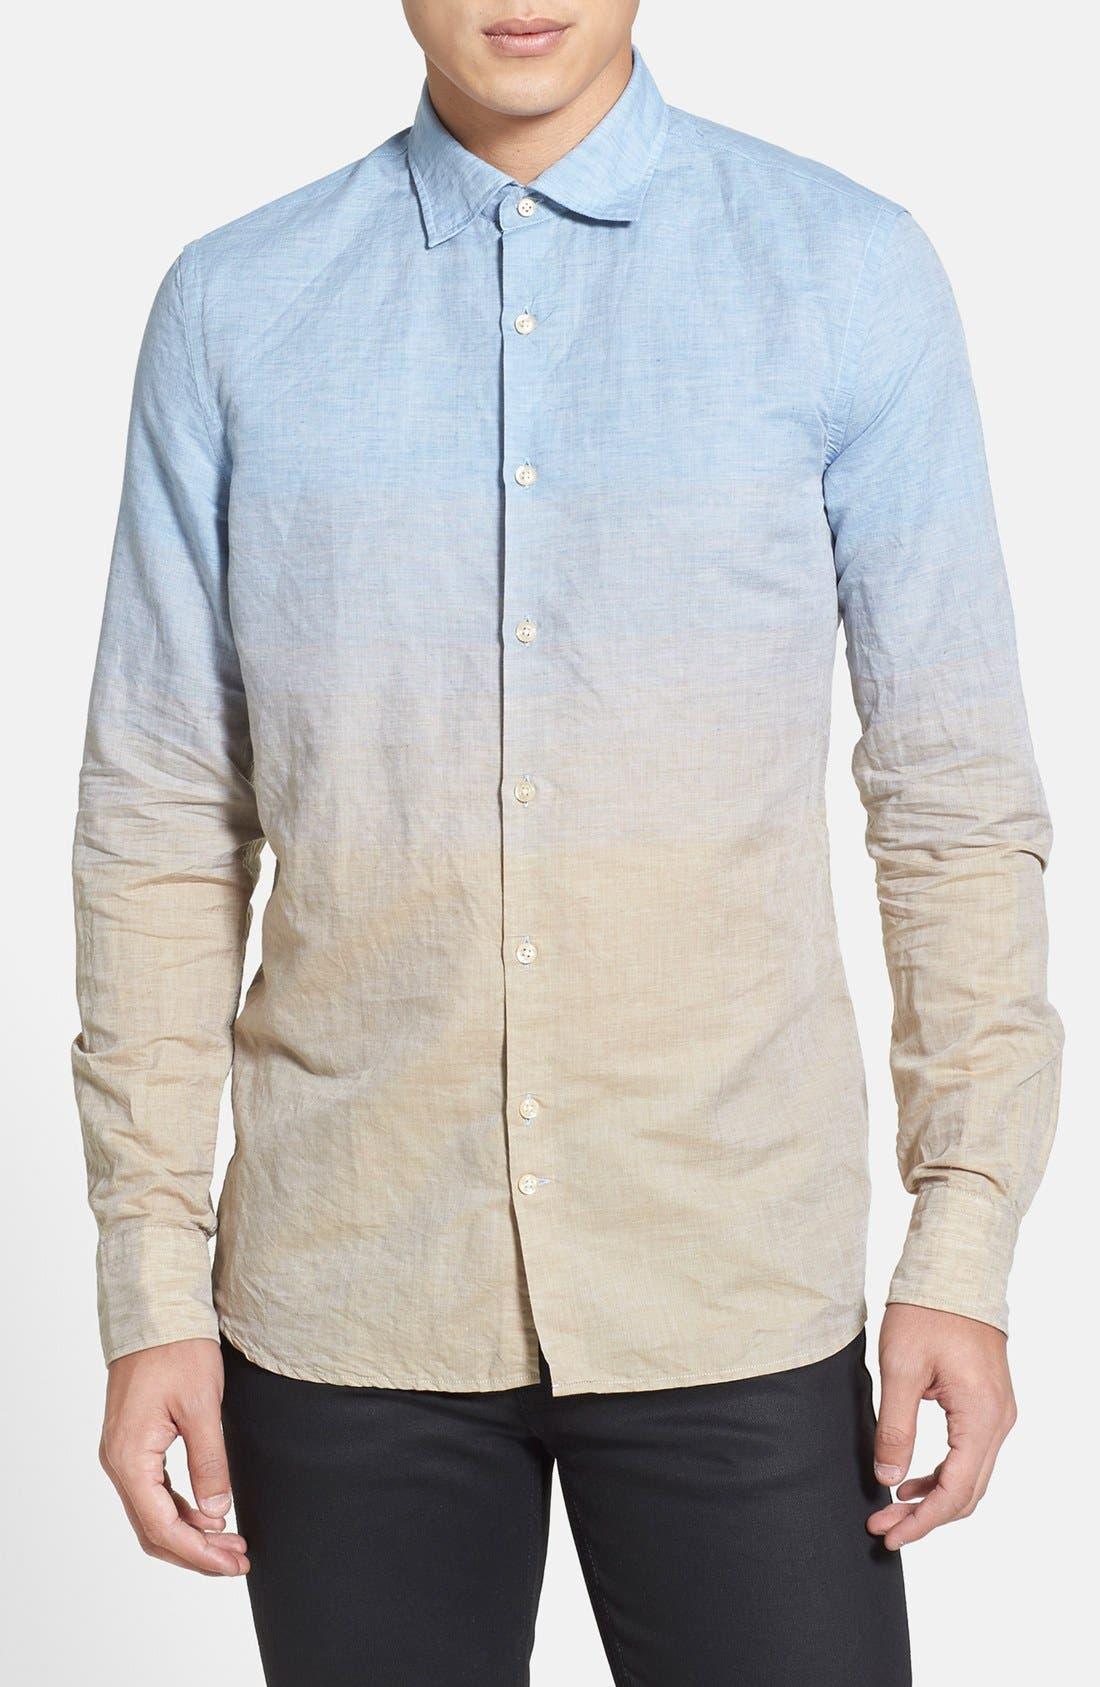 Main Image - J. Lindeberg 'Dani 42 - Sunrise' Slim Fit Sport Shirt